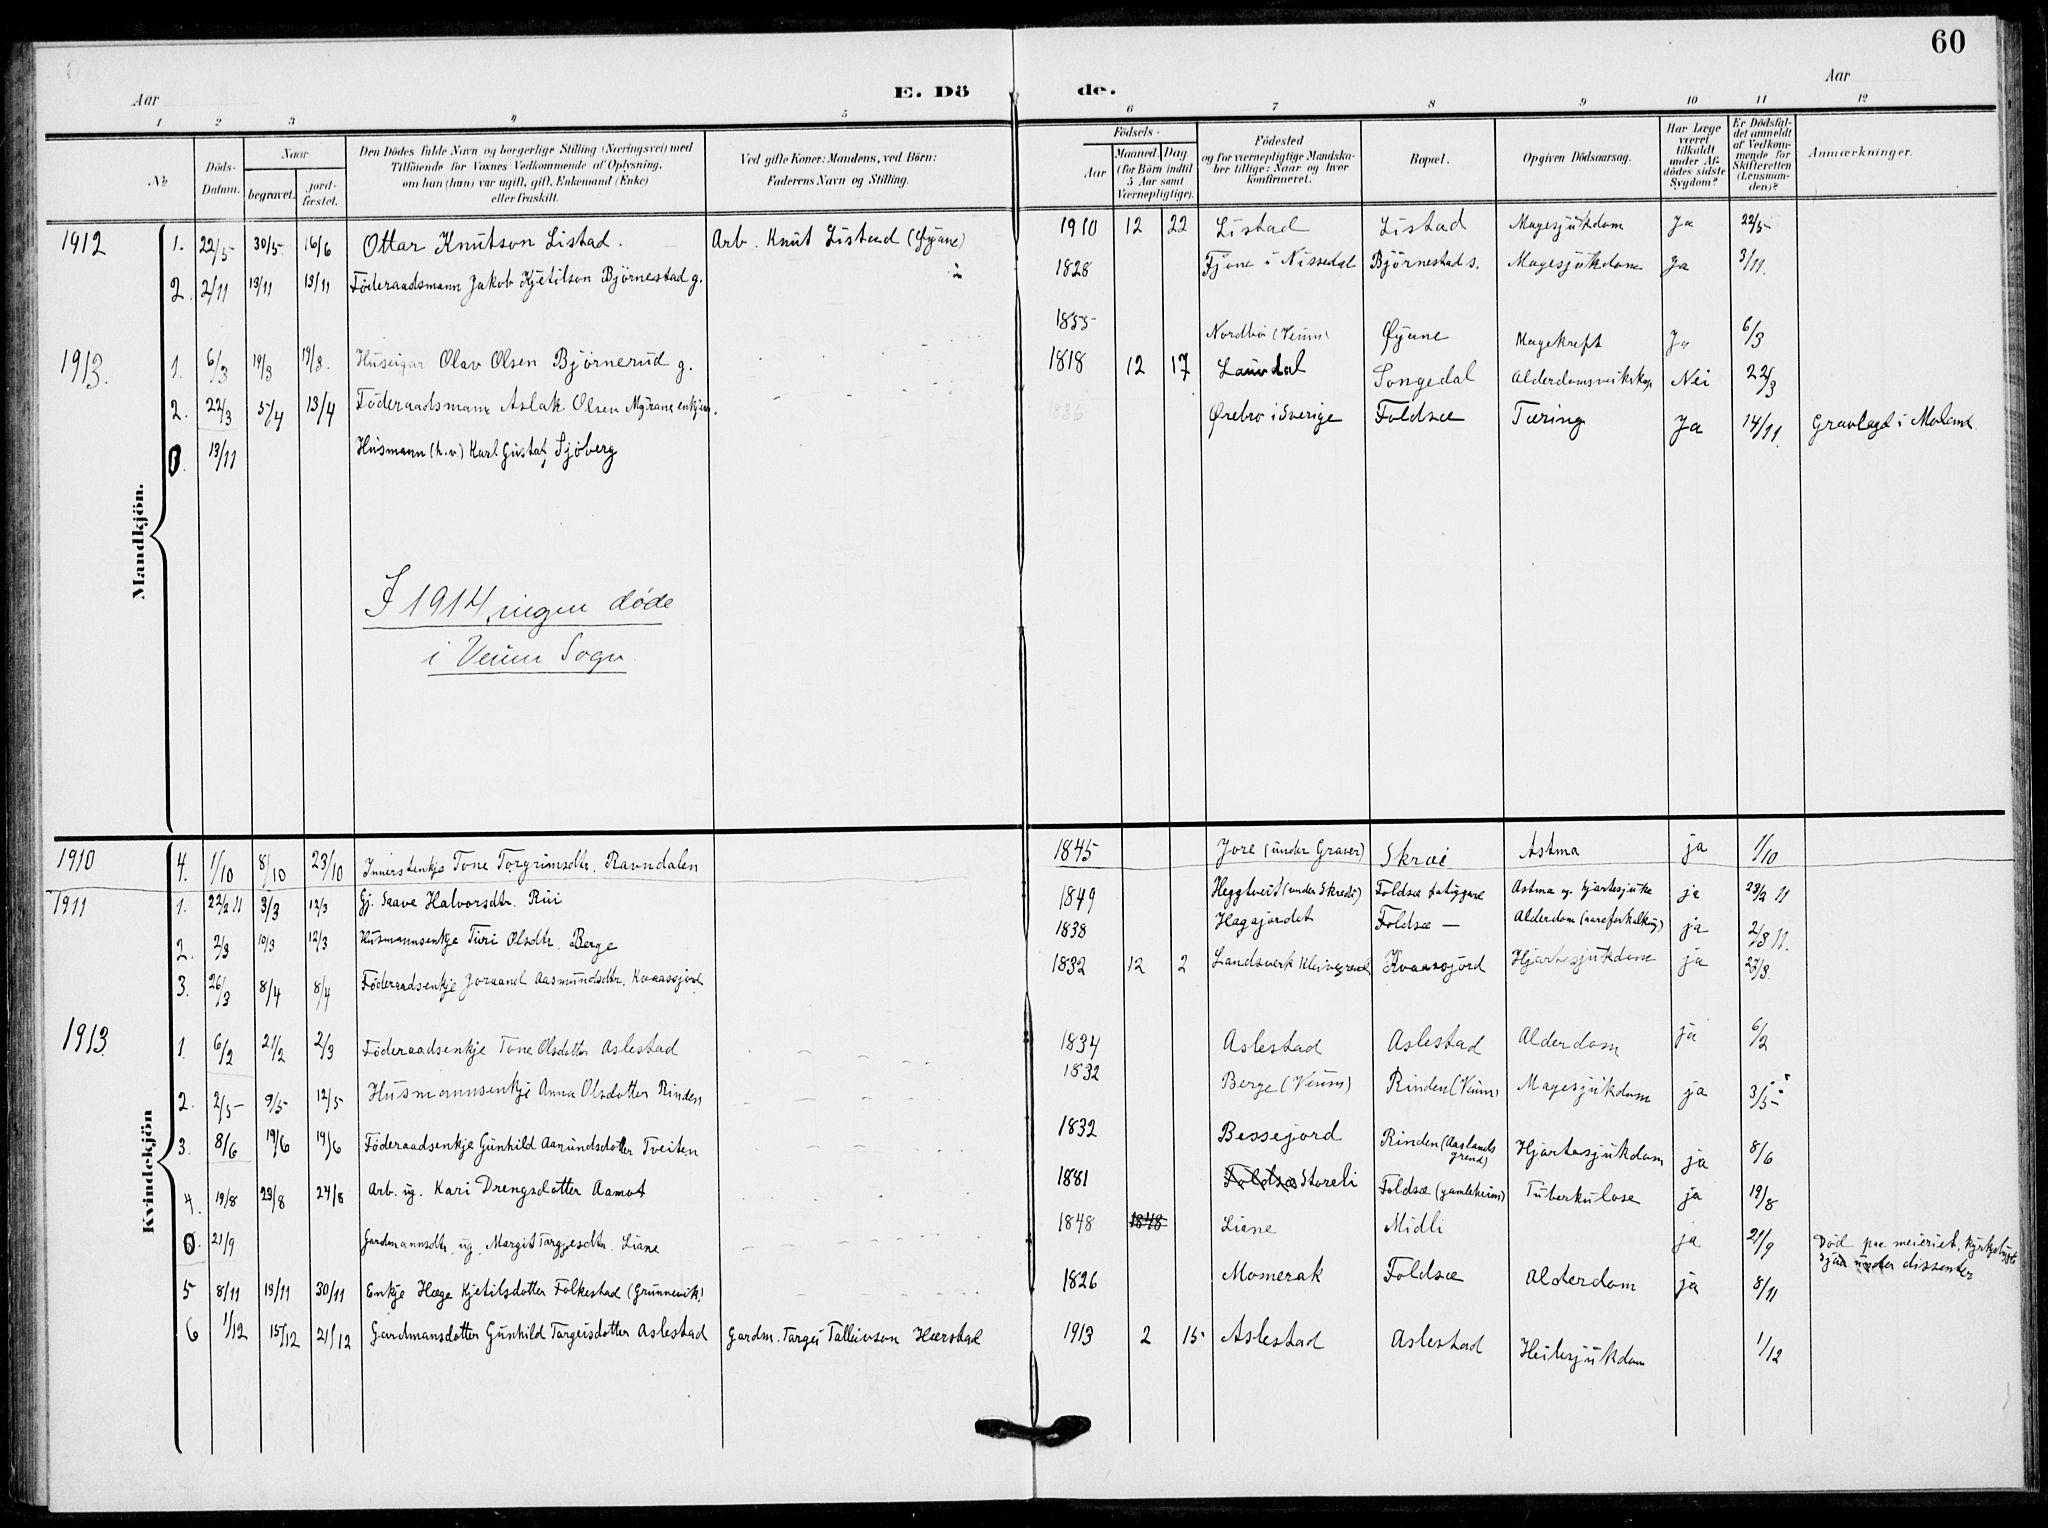 SAKO, Fyresdal kirkebøker, F/Fb/L0004: Ministerialbok nr. II 4, 1903-1920, s. 60